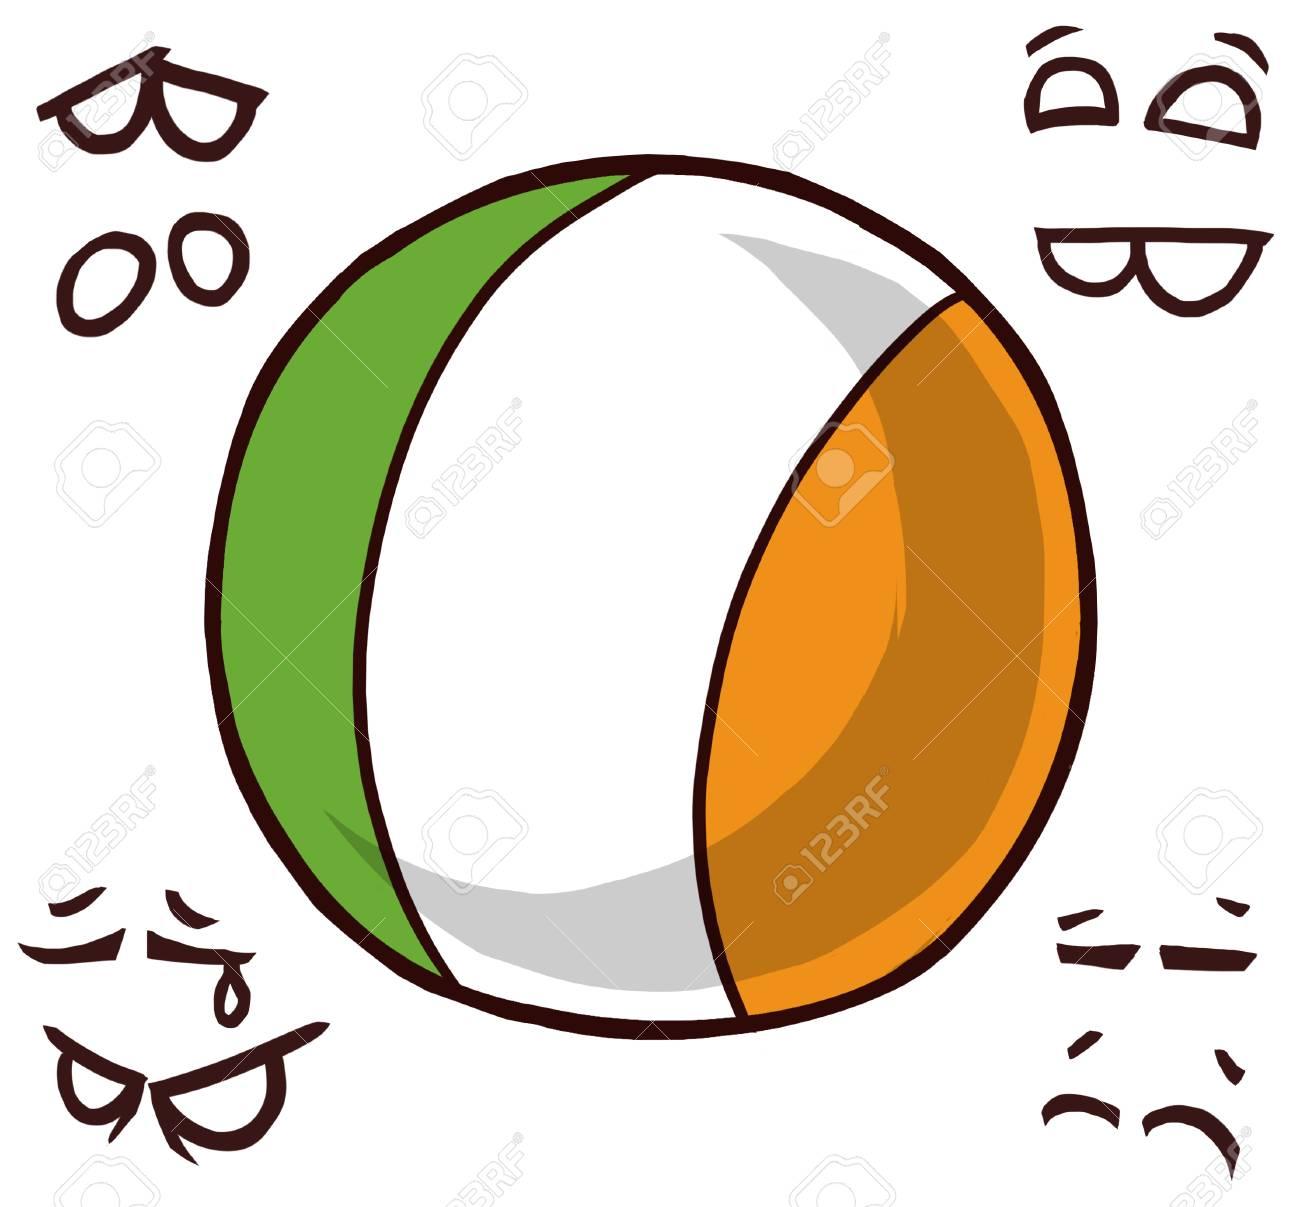 Ireland country ball - 110723144